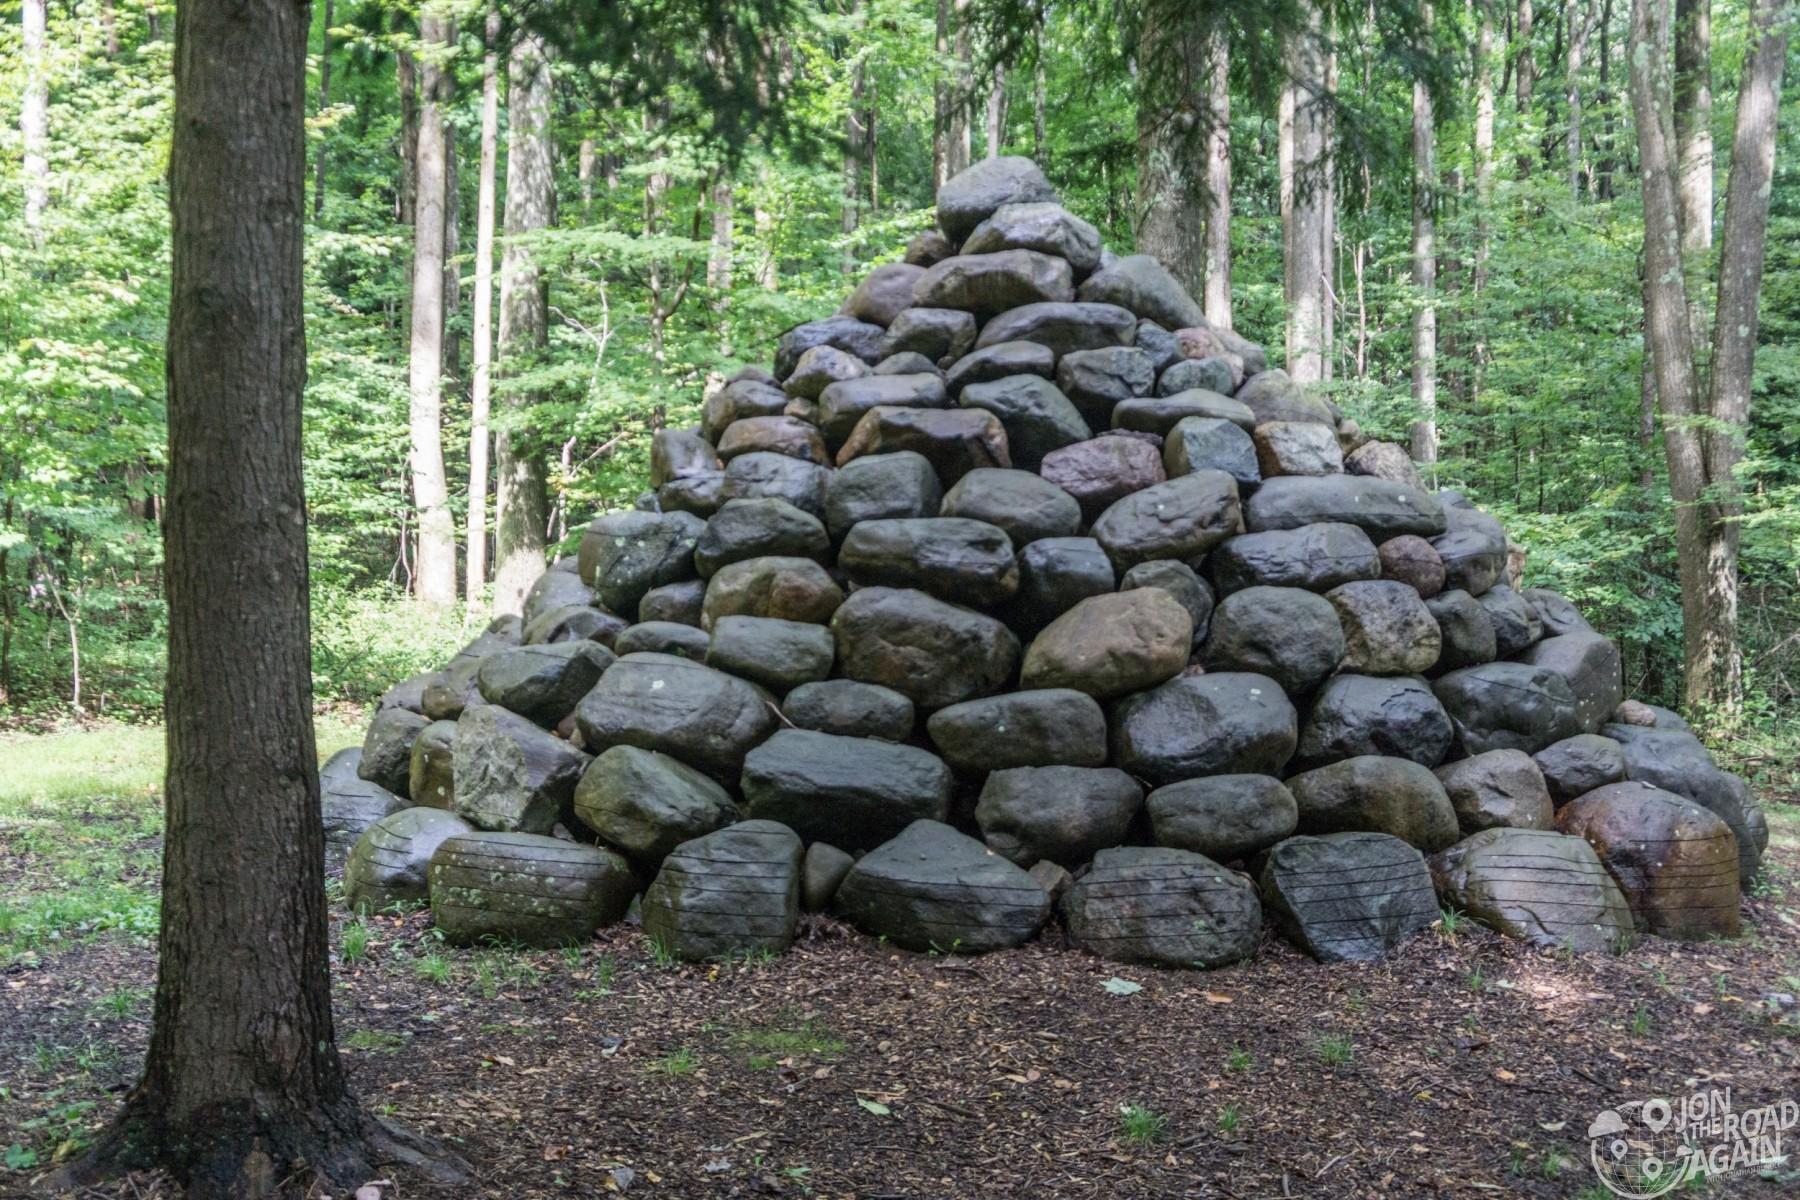 Kentuck Knob Andy Goldsworthy Rock Cairn